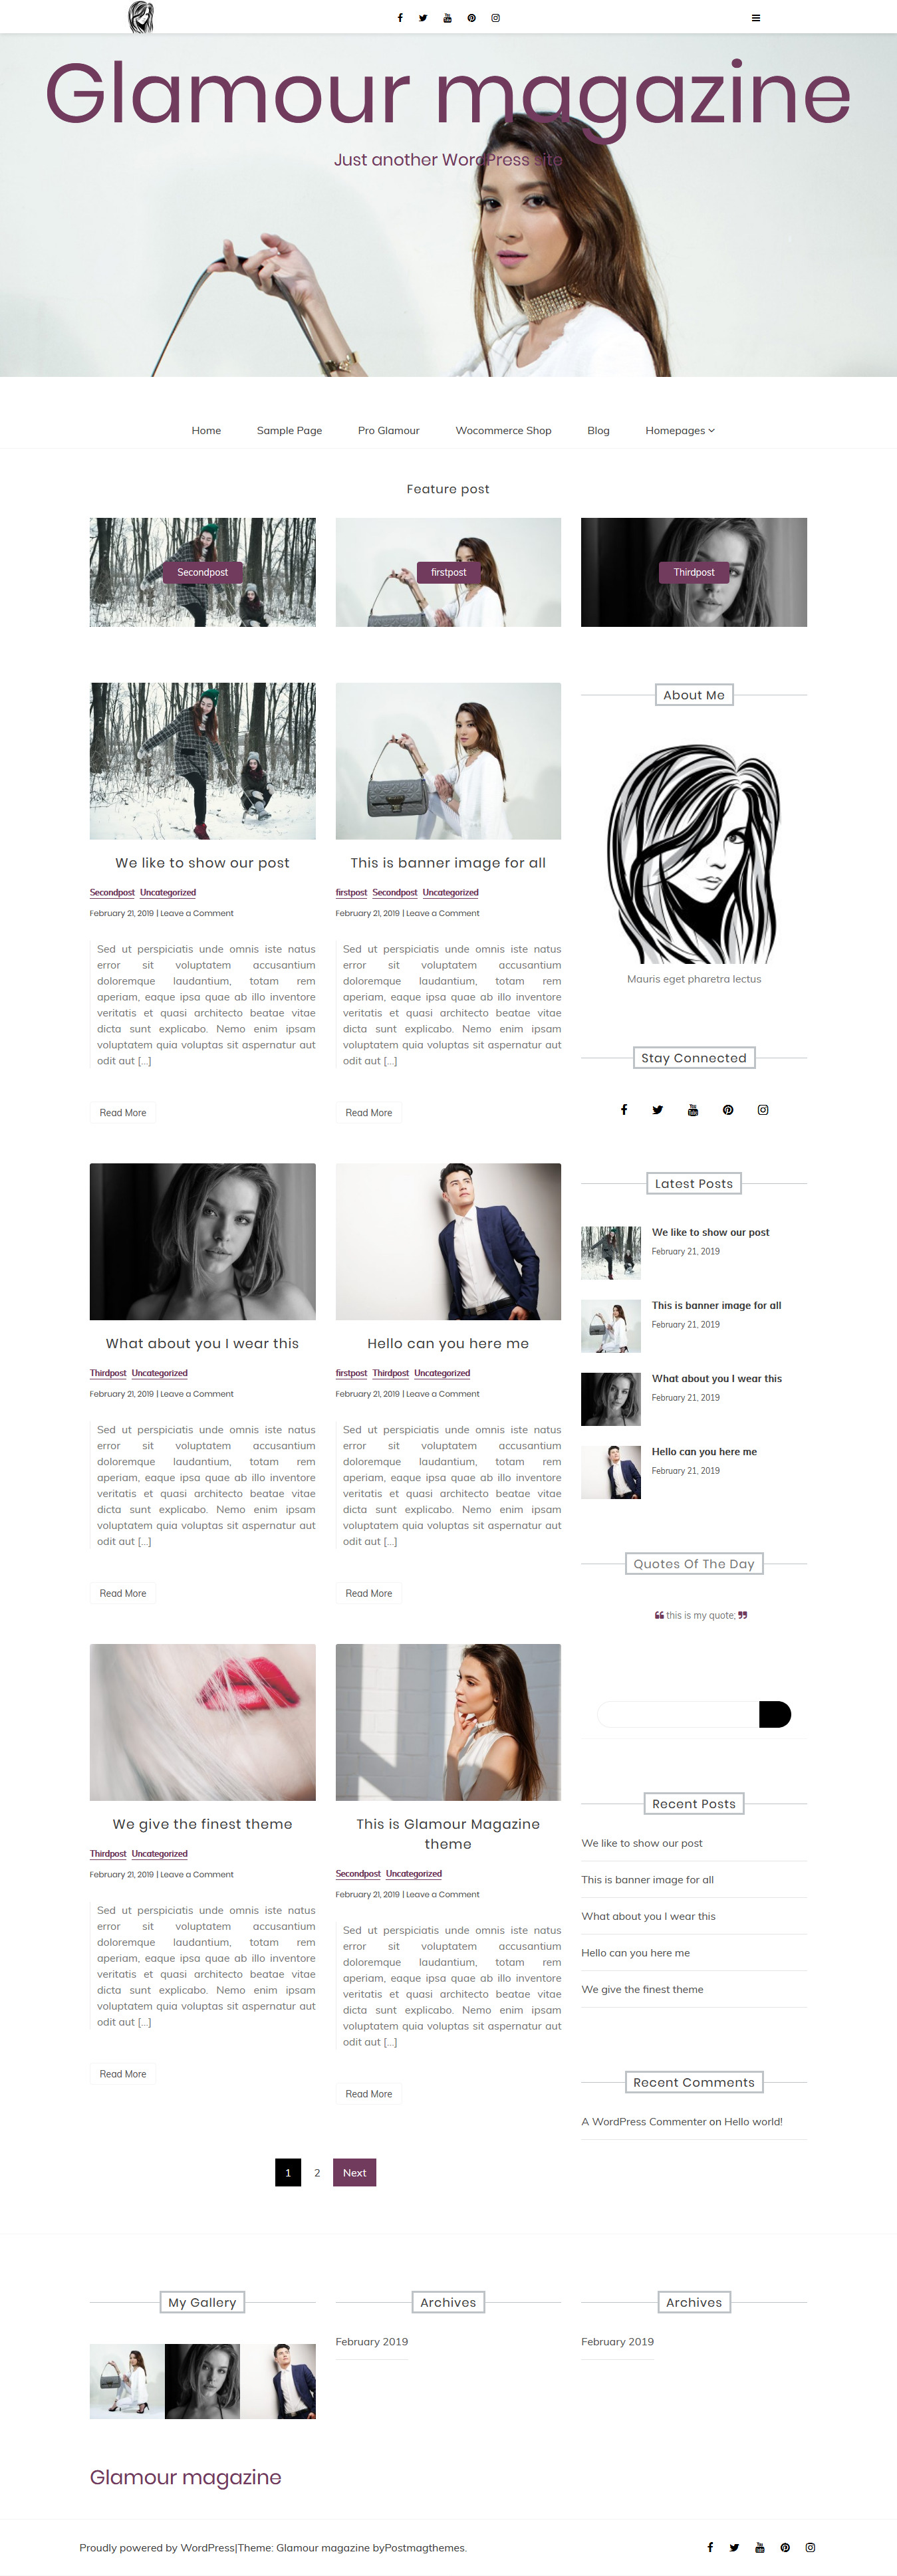 glamour magazine best free review wordpress theme - 10+ Best Free Review WordPress Themes